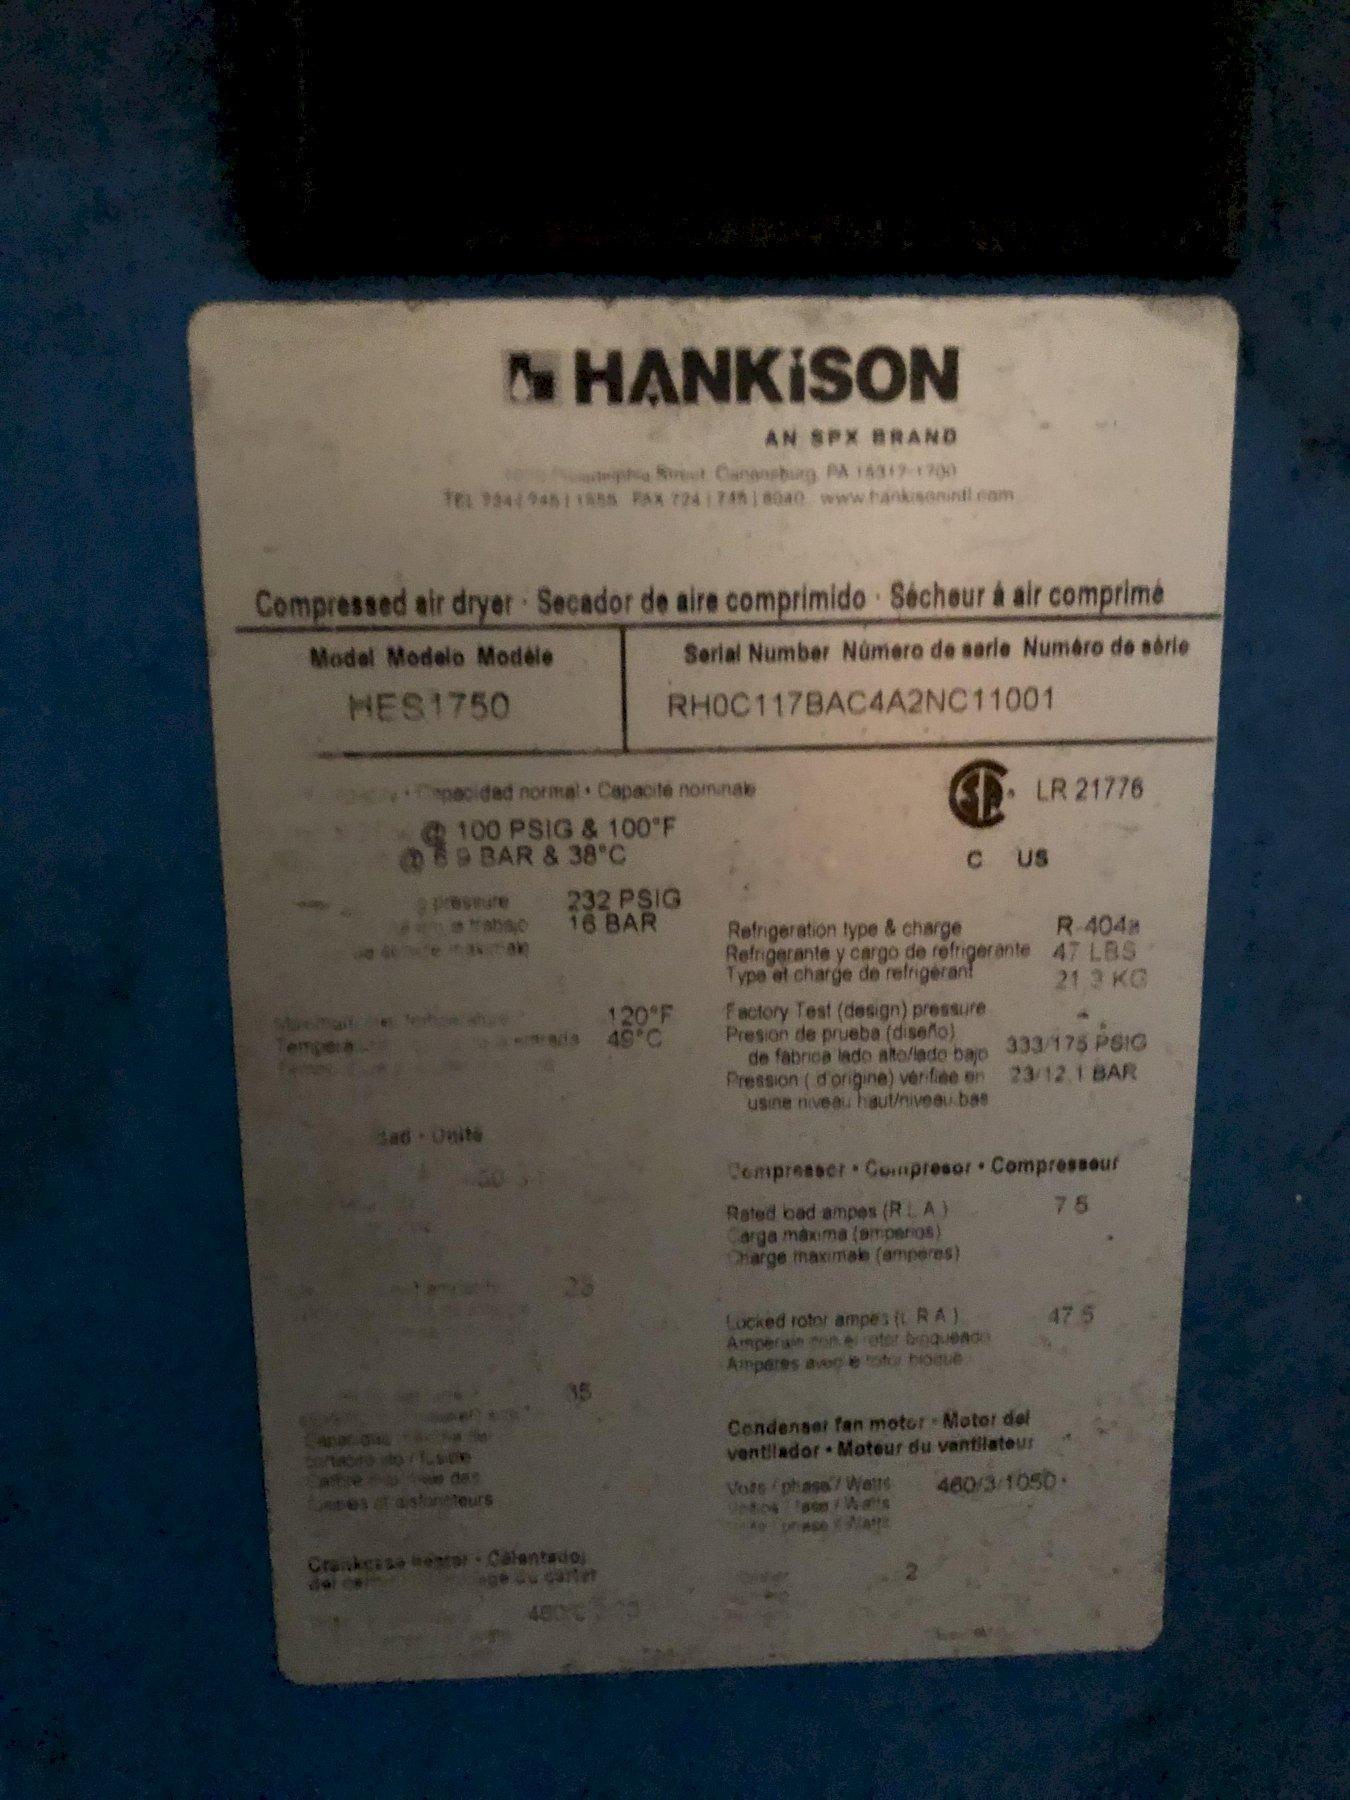 HANKISON MODEL HES1750 1750 CFM AIR DRYER S/N RHOC117BAC4A2NC11001